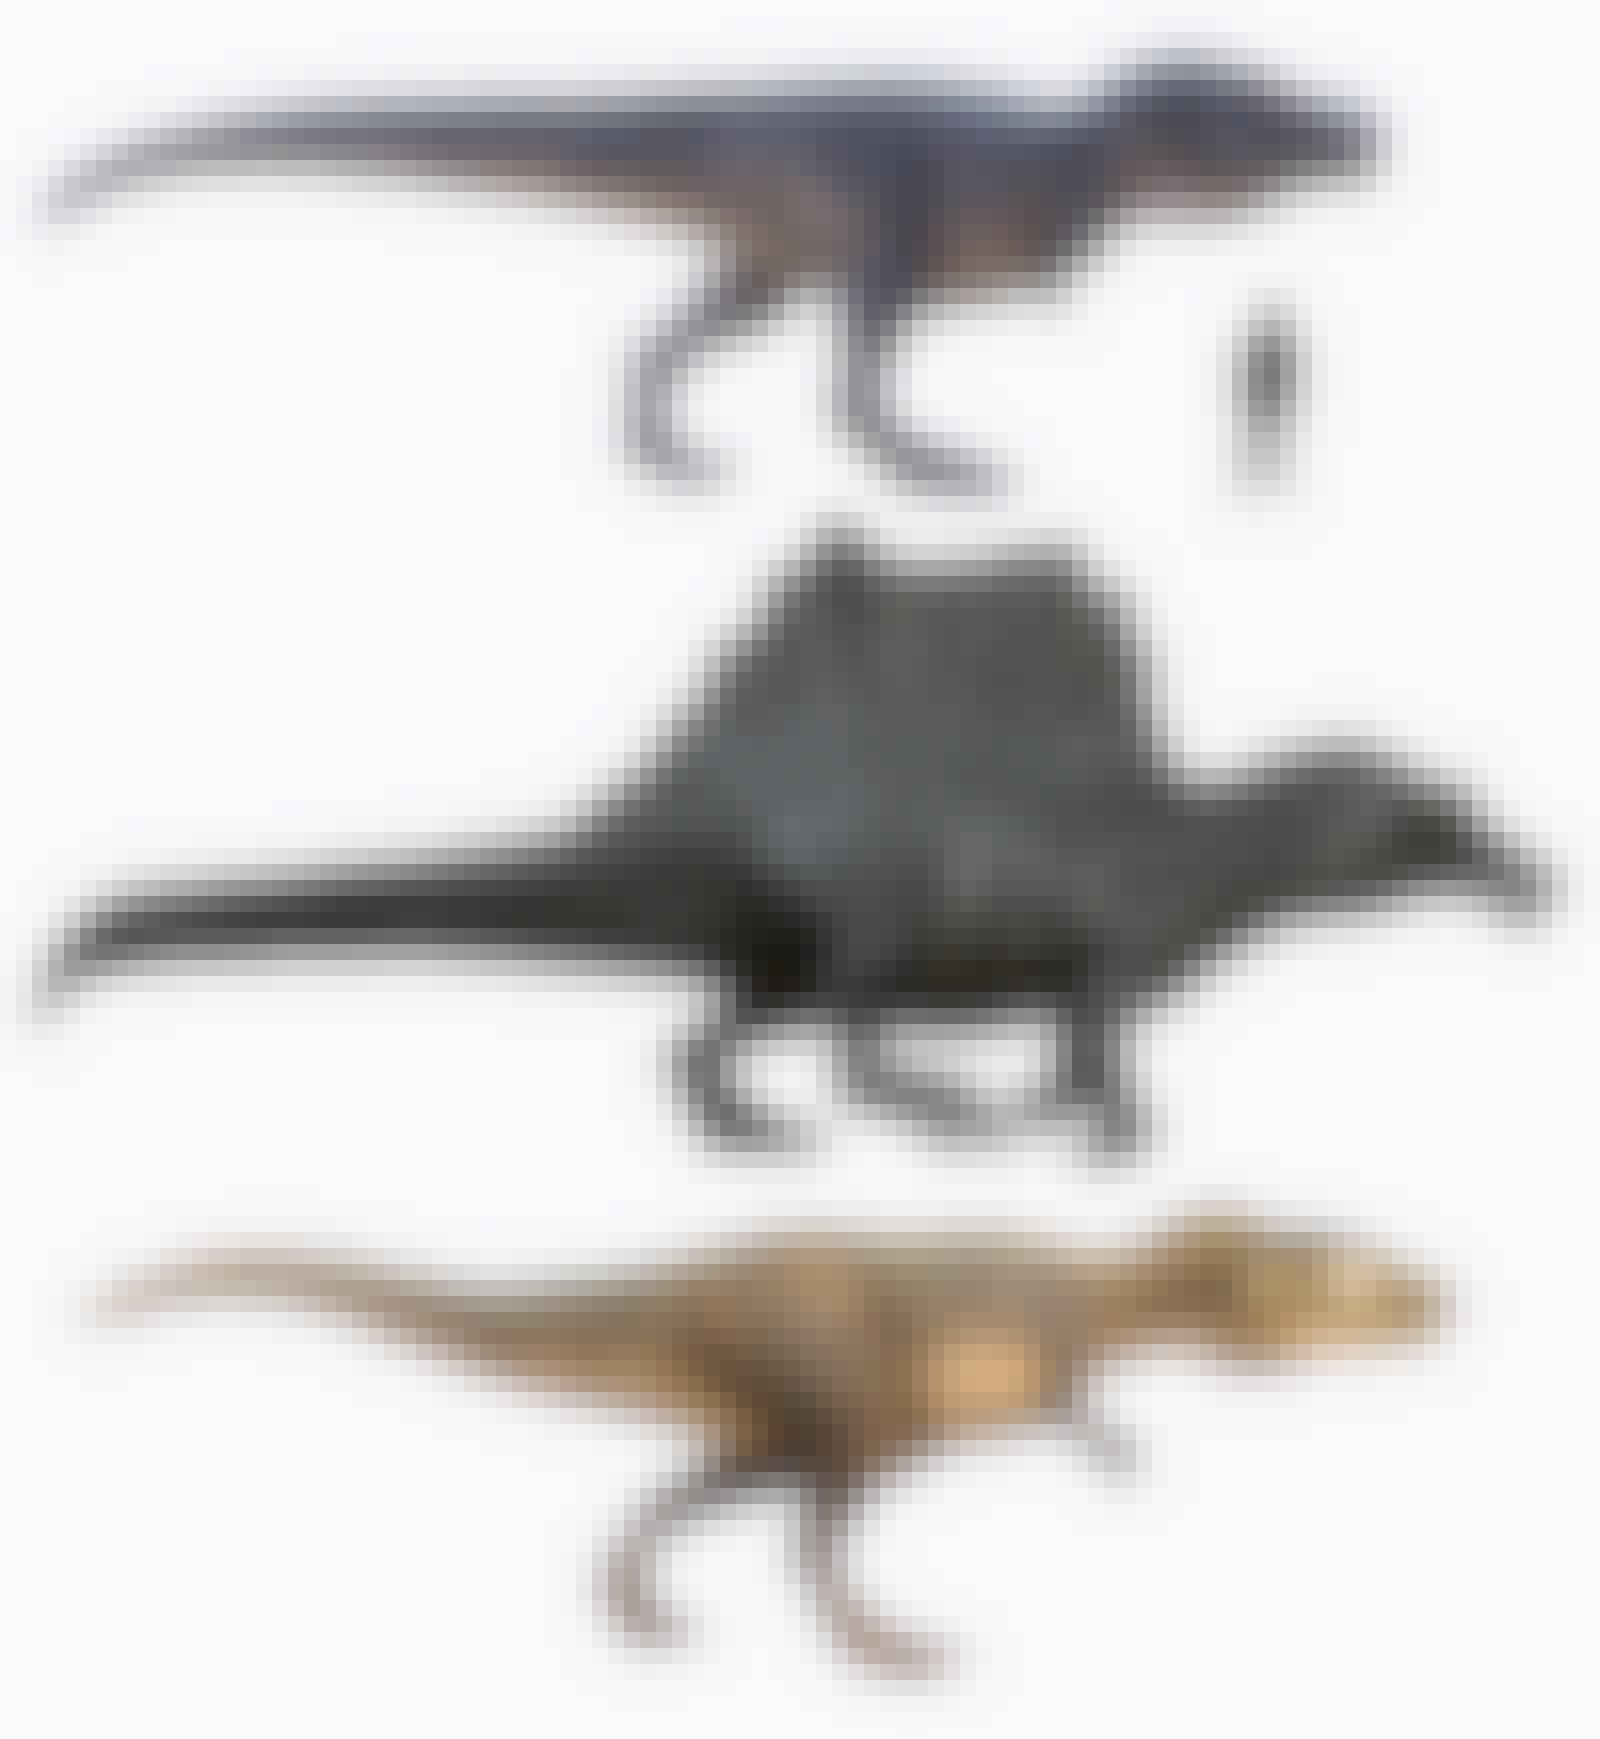 T. rex en andere grote roofdinosauriërs